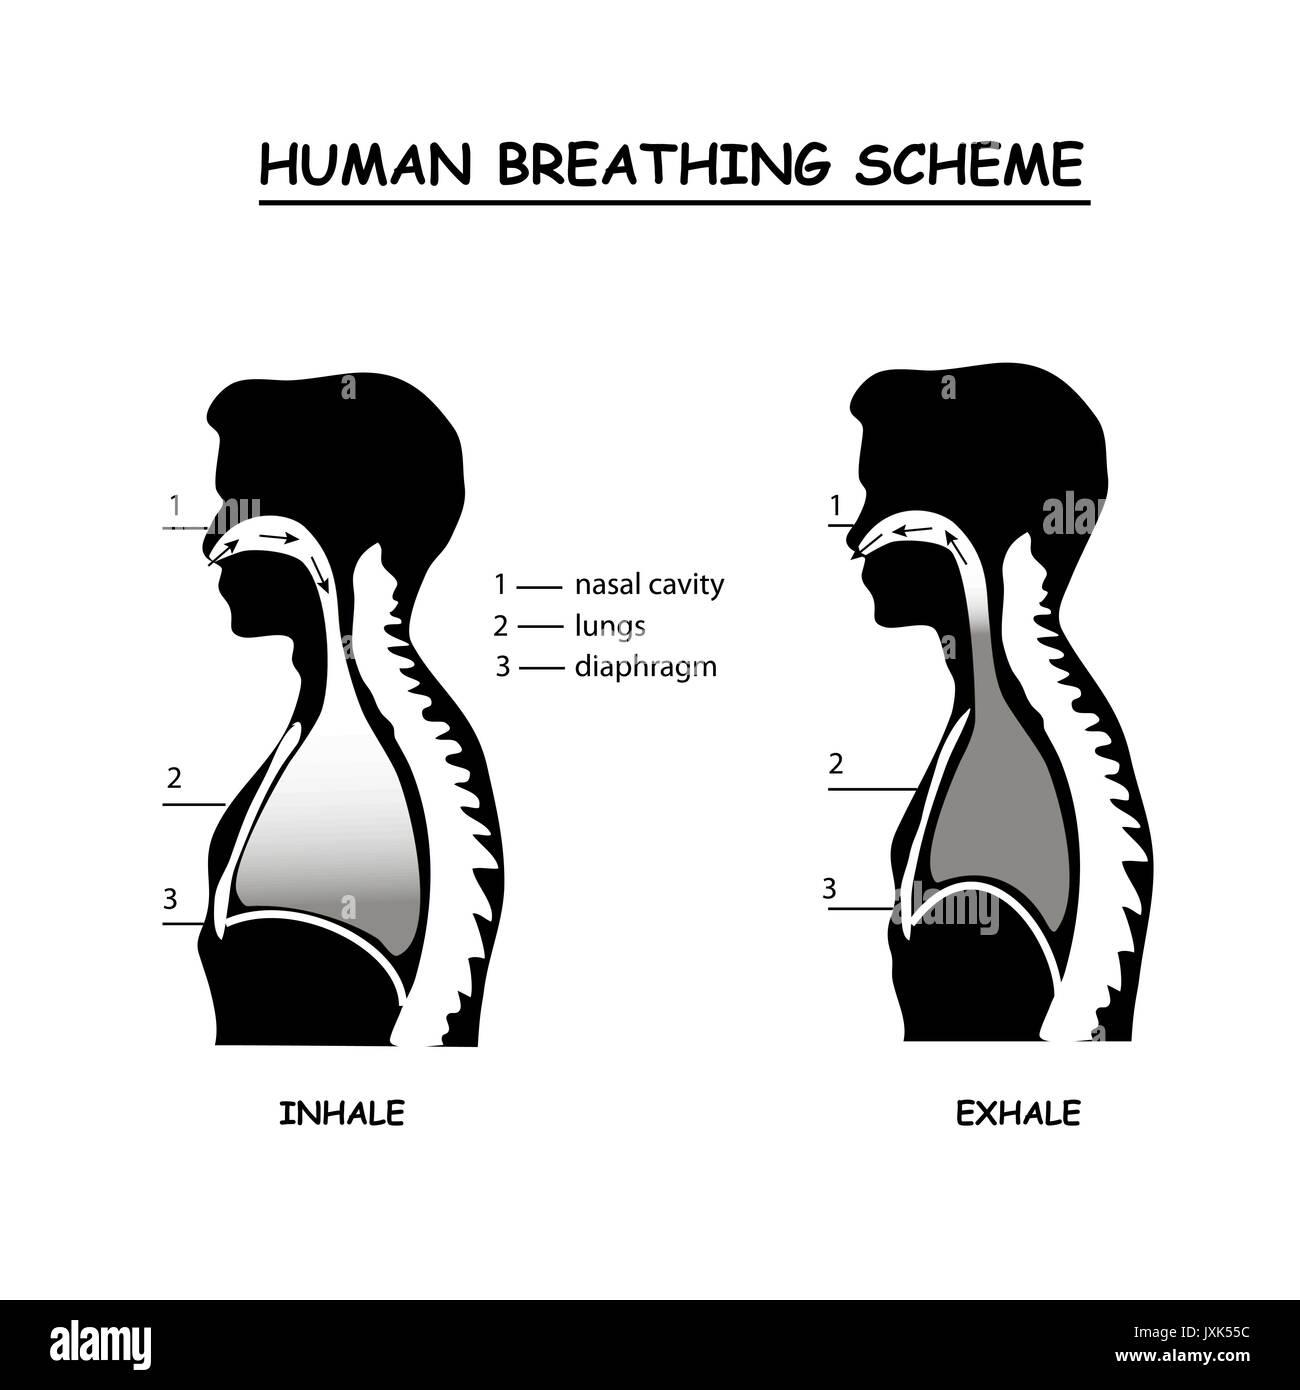 Human Breathing Scheme Info Graphic In Monochrome Stock Vector Art Inhalation And Exhalation Diagram Inhalingdiagram